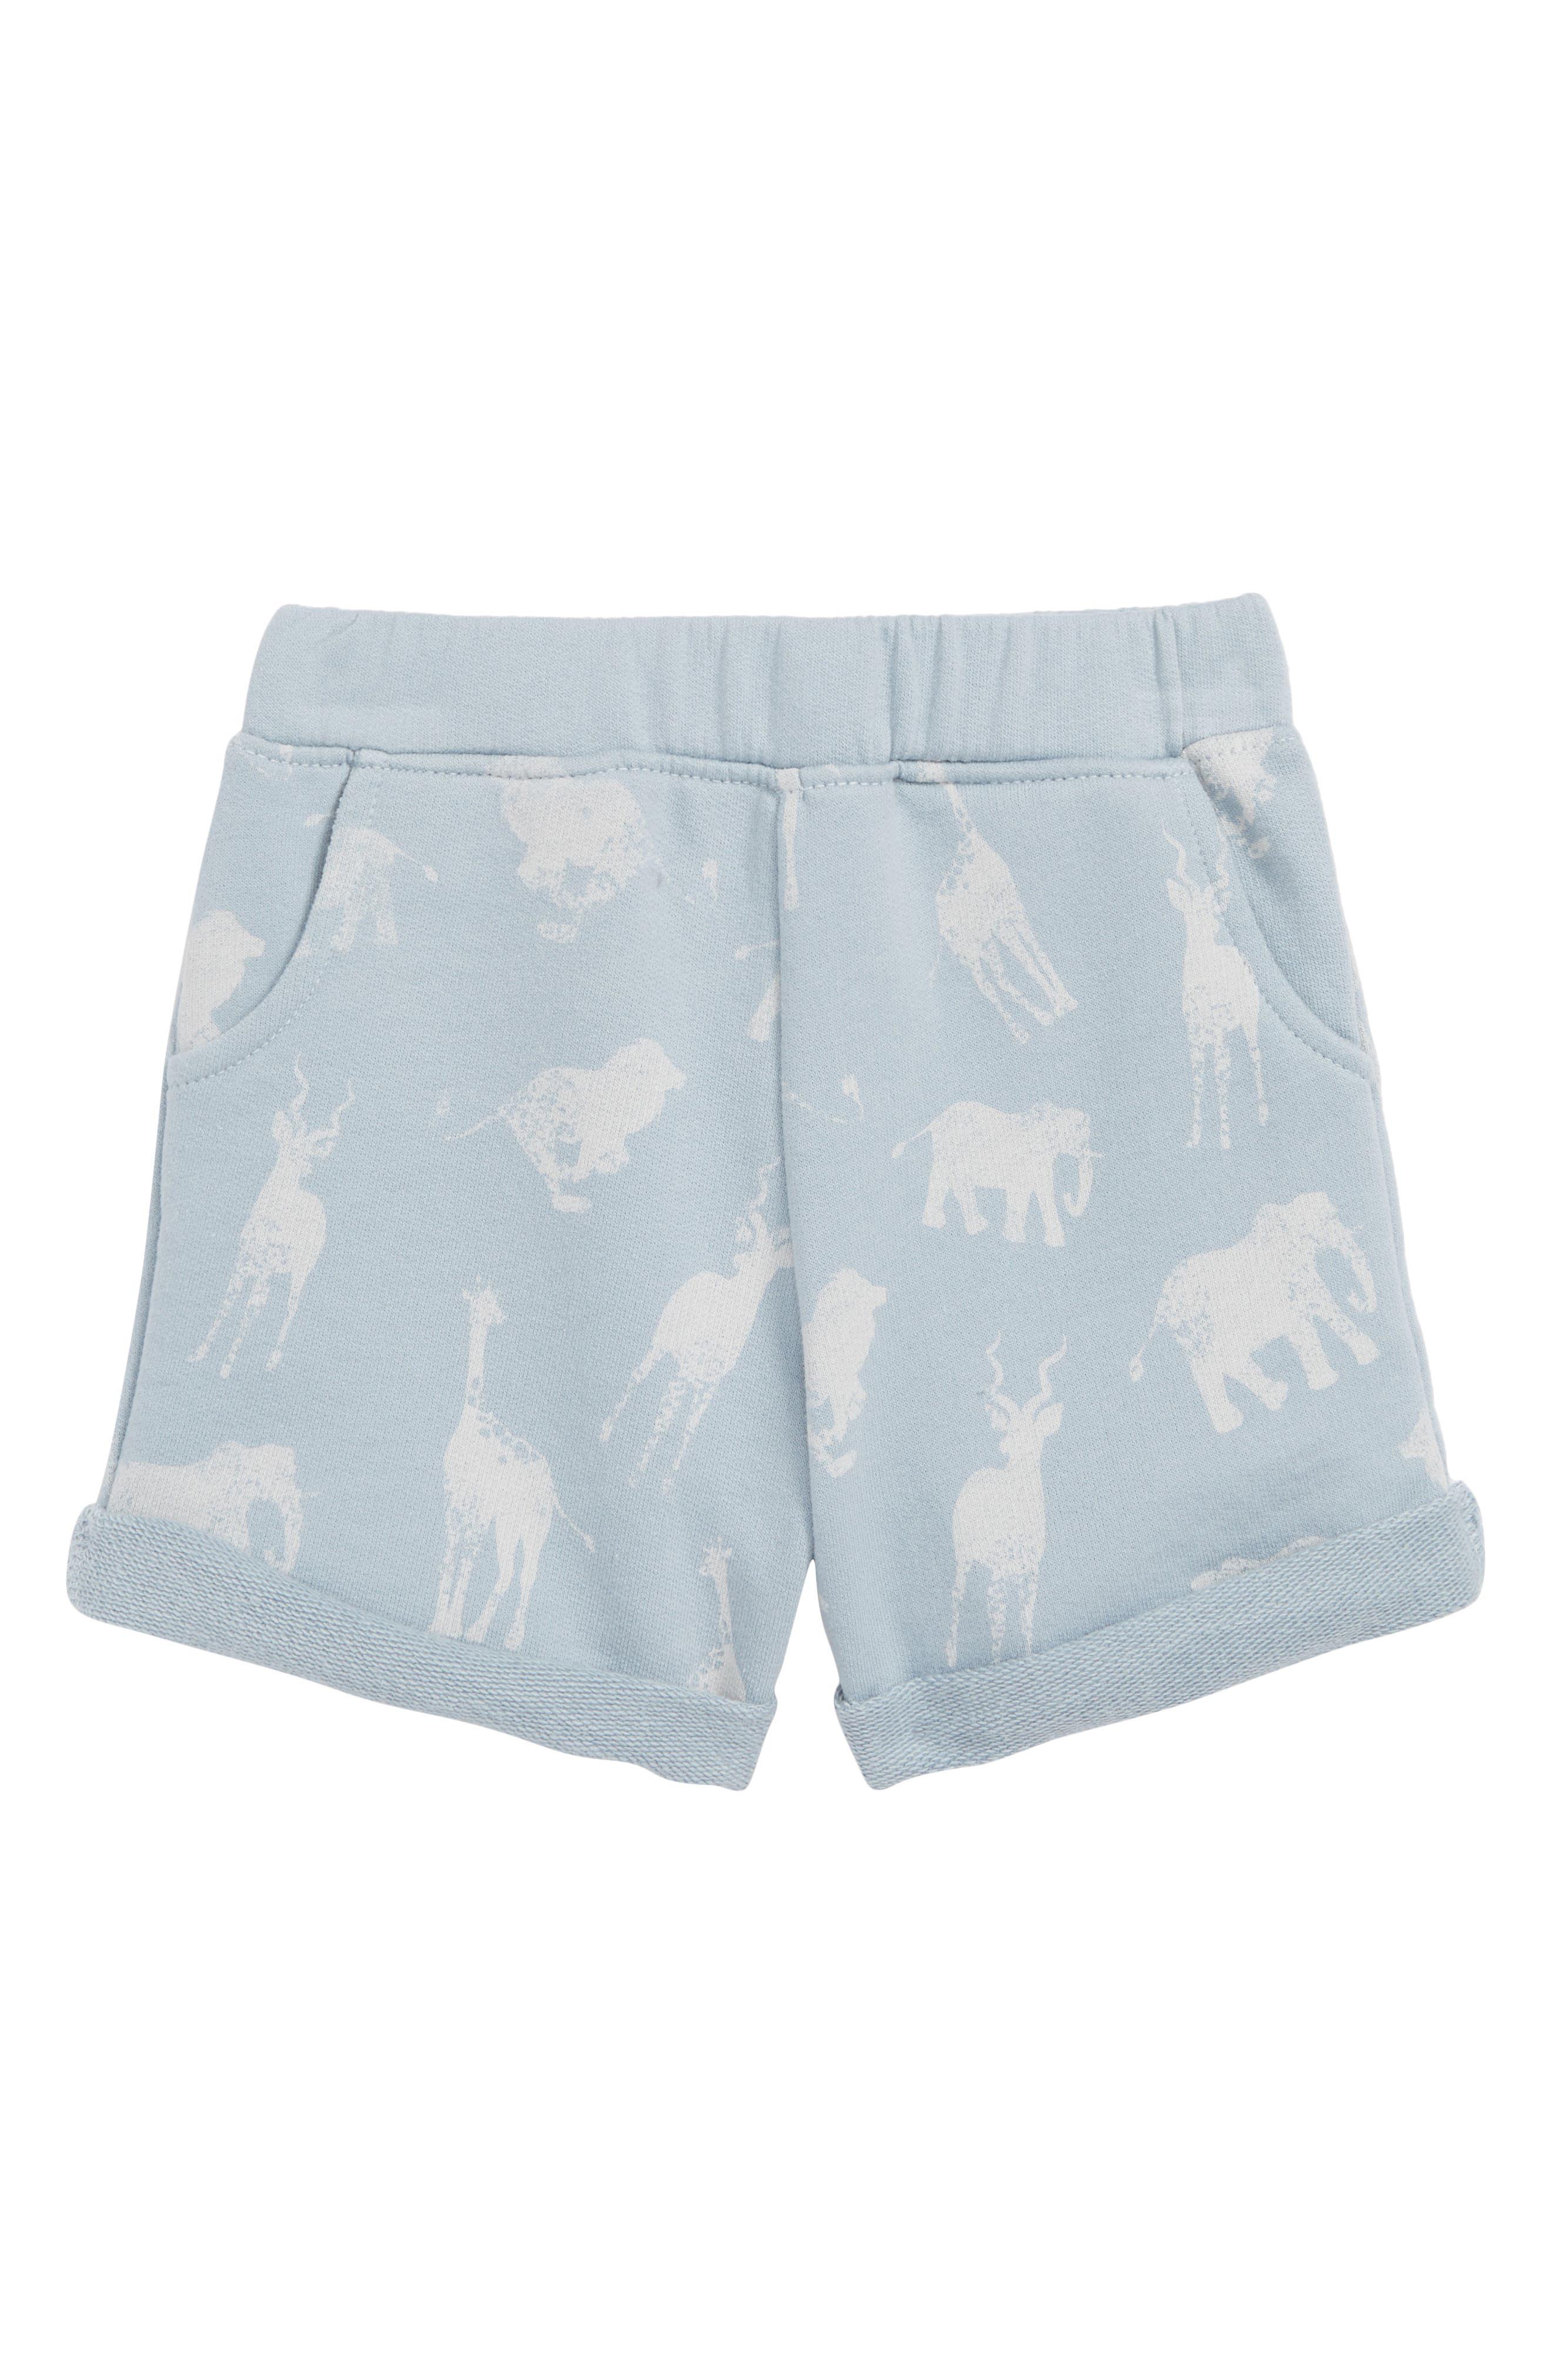 Peek Safari Shorts (Baby)